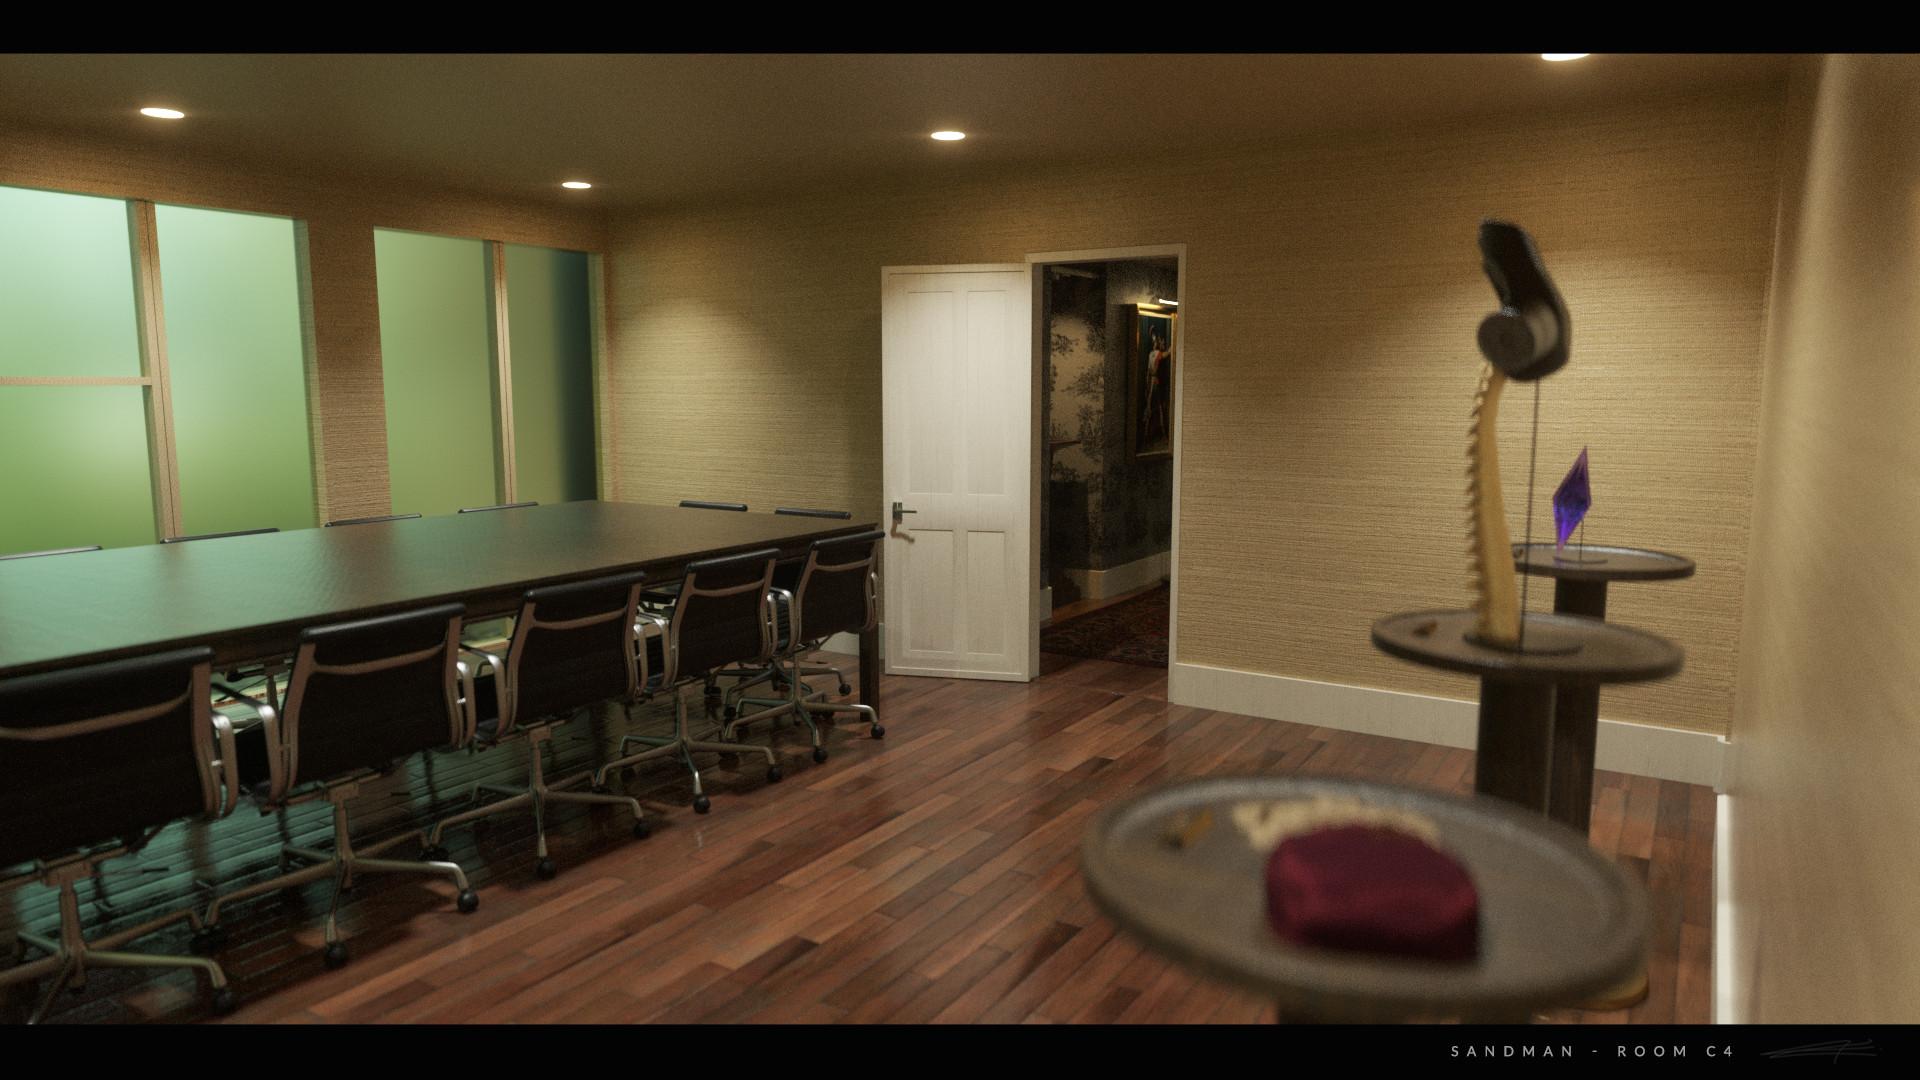 SM_Set_Room_C4_v1.jpg